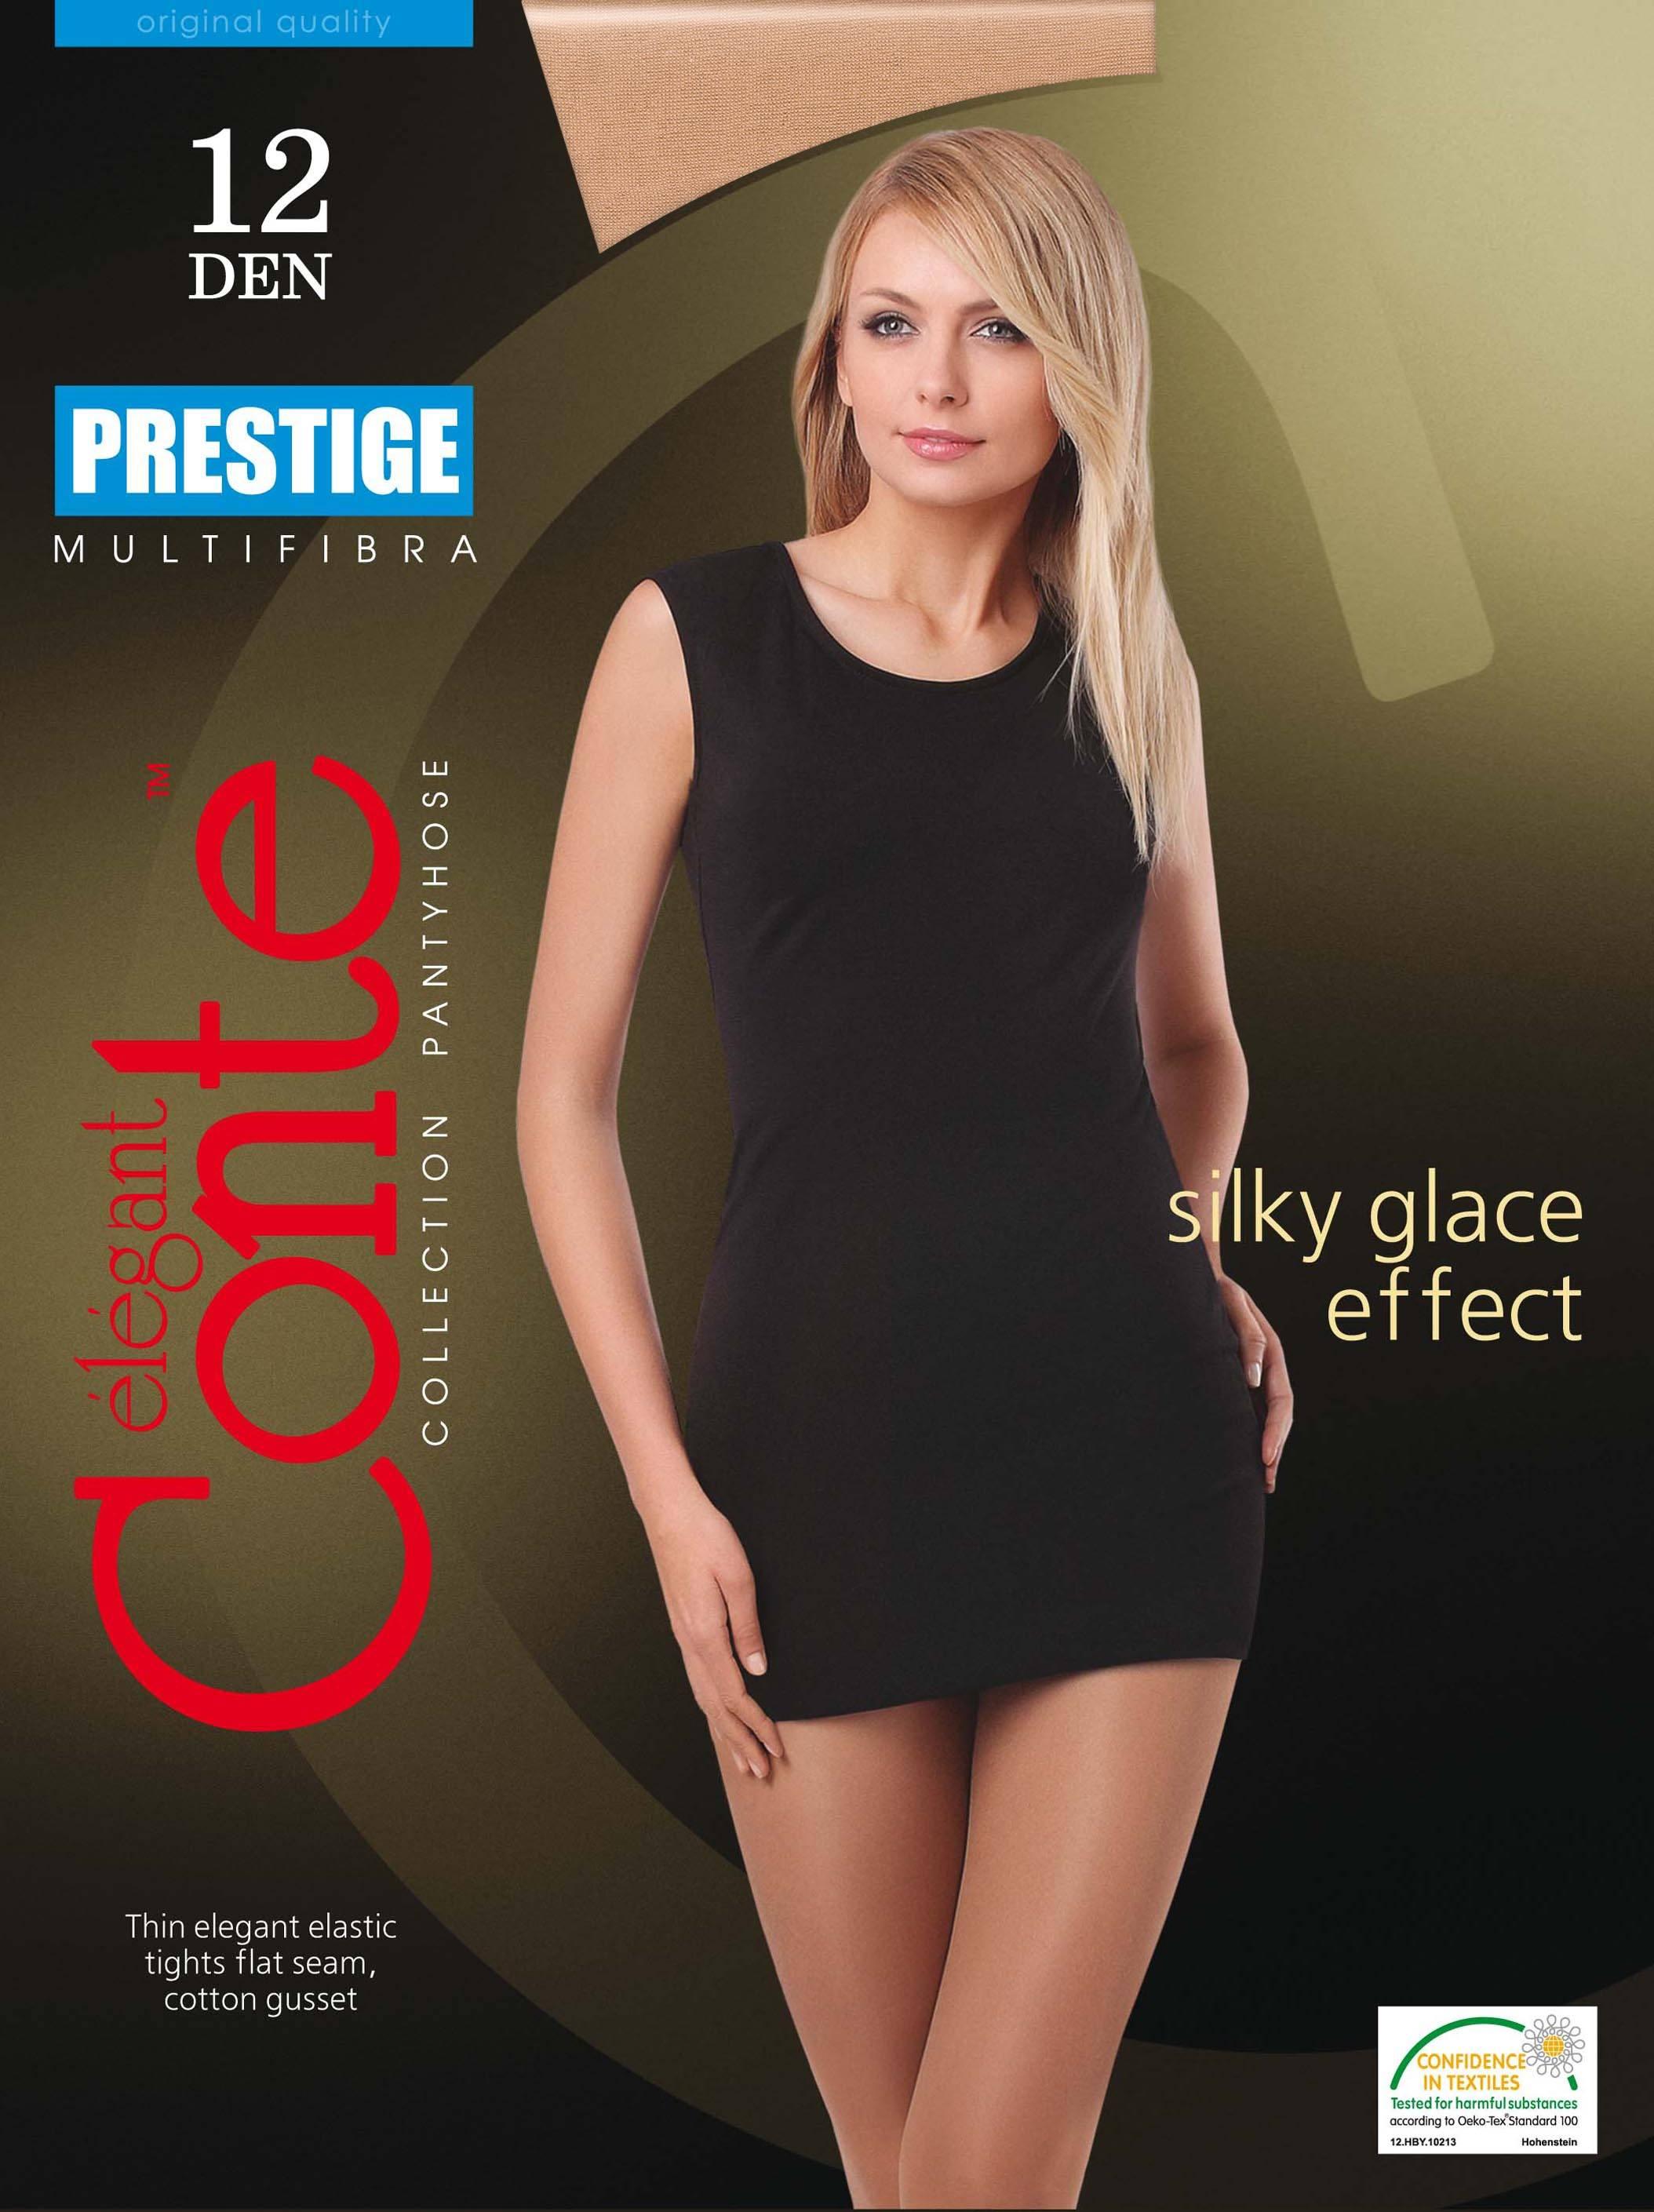 https://golden-legs.com.ua/images/stories/virtuemart/product/03bd09cc86c4b42e27541e5ffe86d4097.jpg